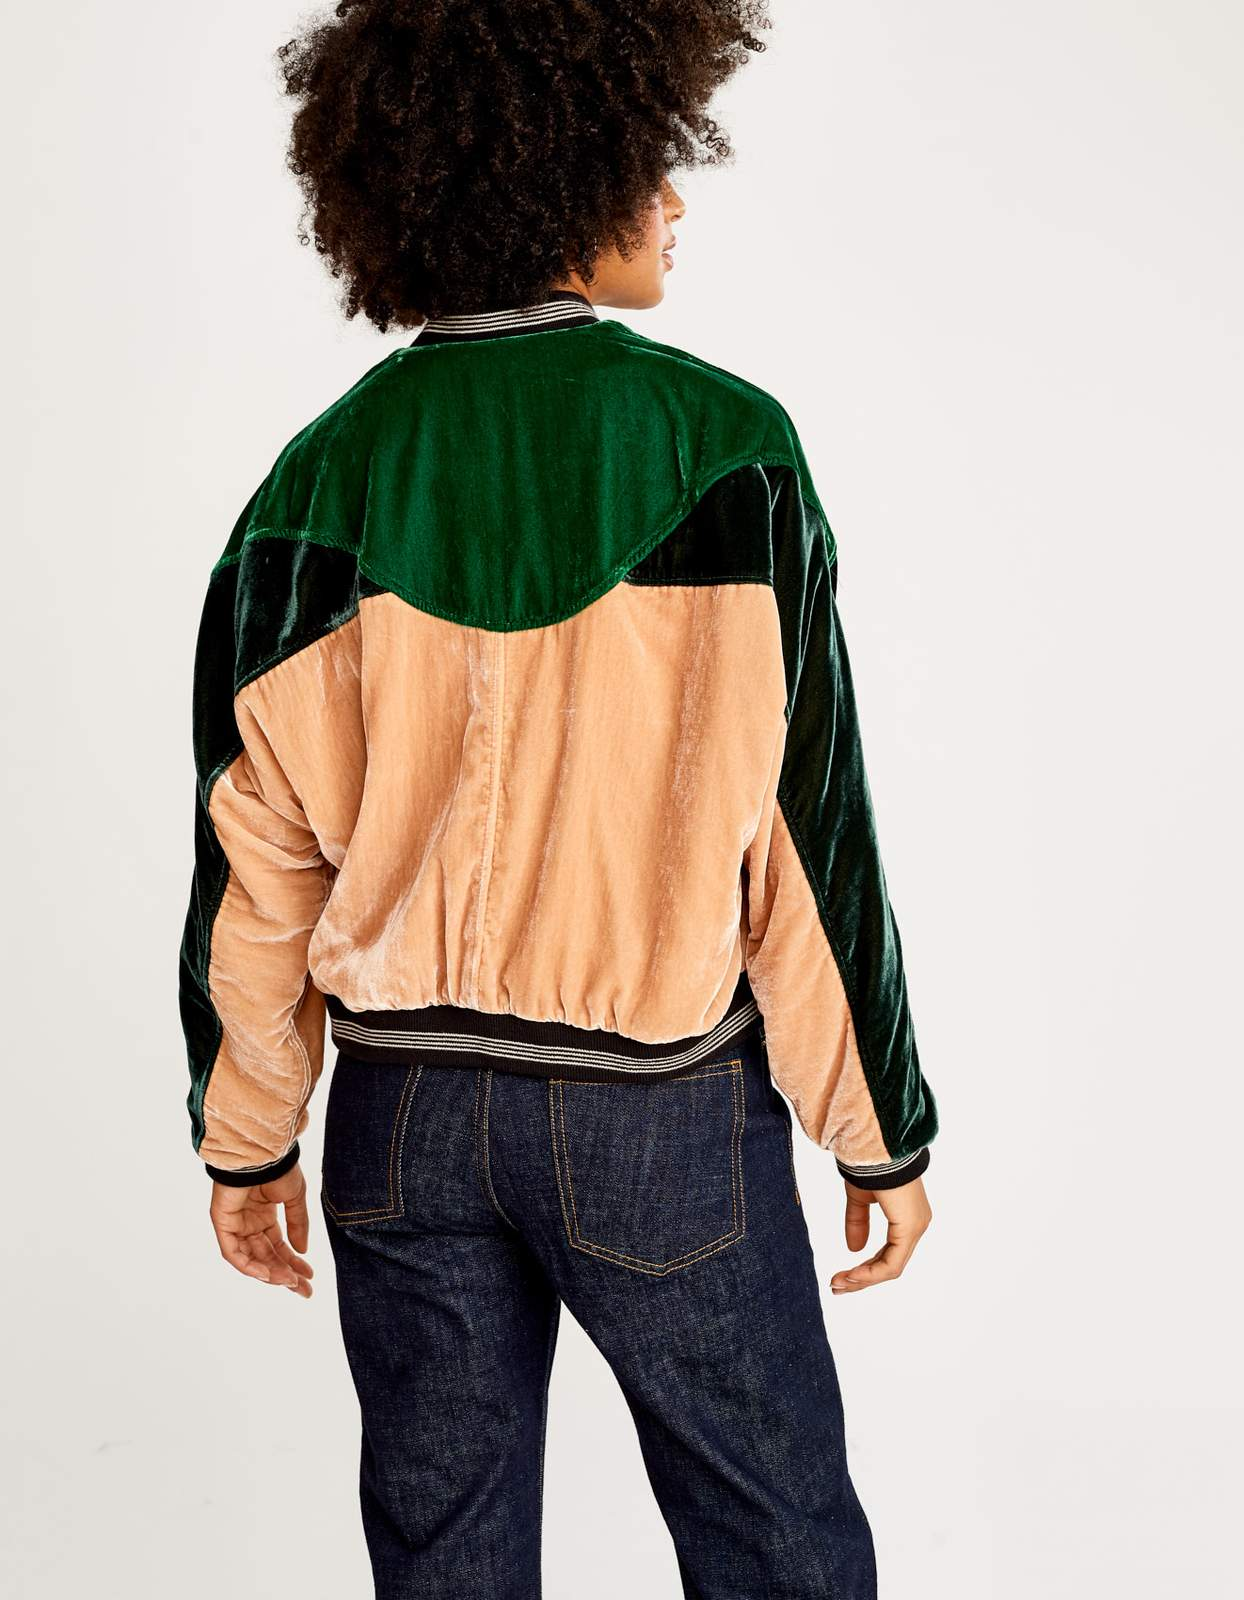 Bellerose-jacket-joe91-p1007_7_1600x1600.jpg